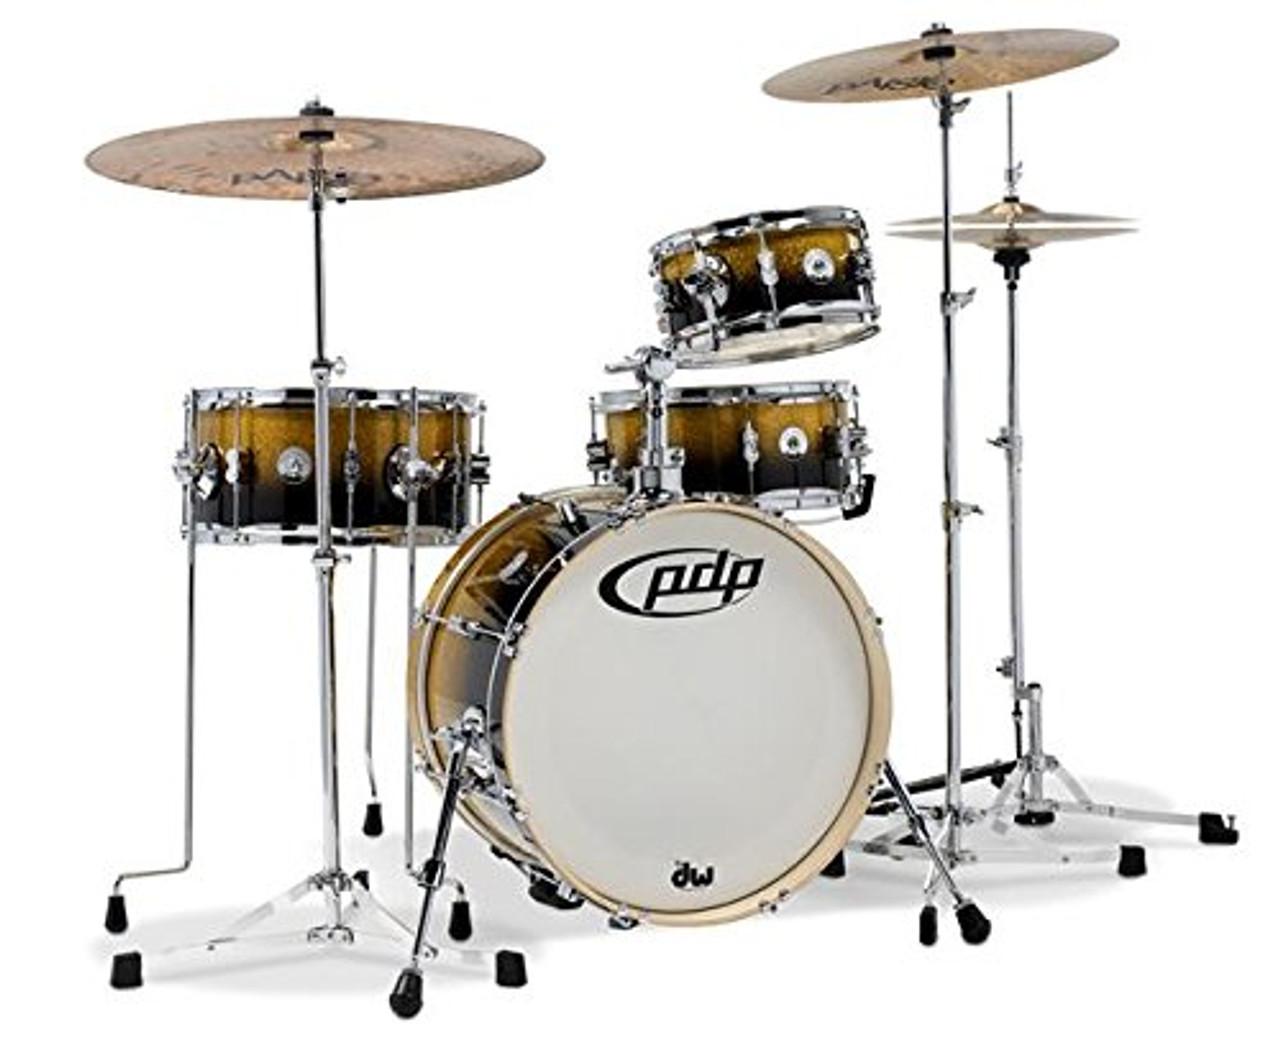 Drum Workshop Daru Jones 4pc, Bags & 6000 Hw, Gold-Blk